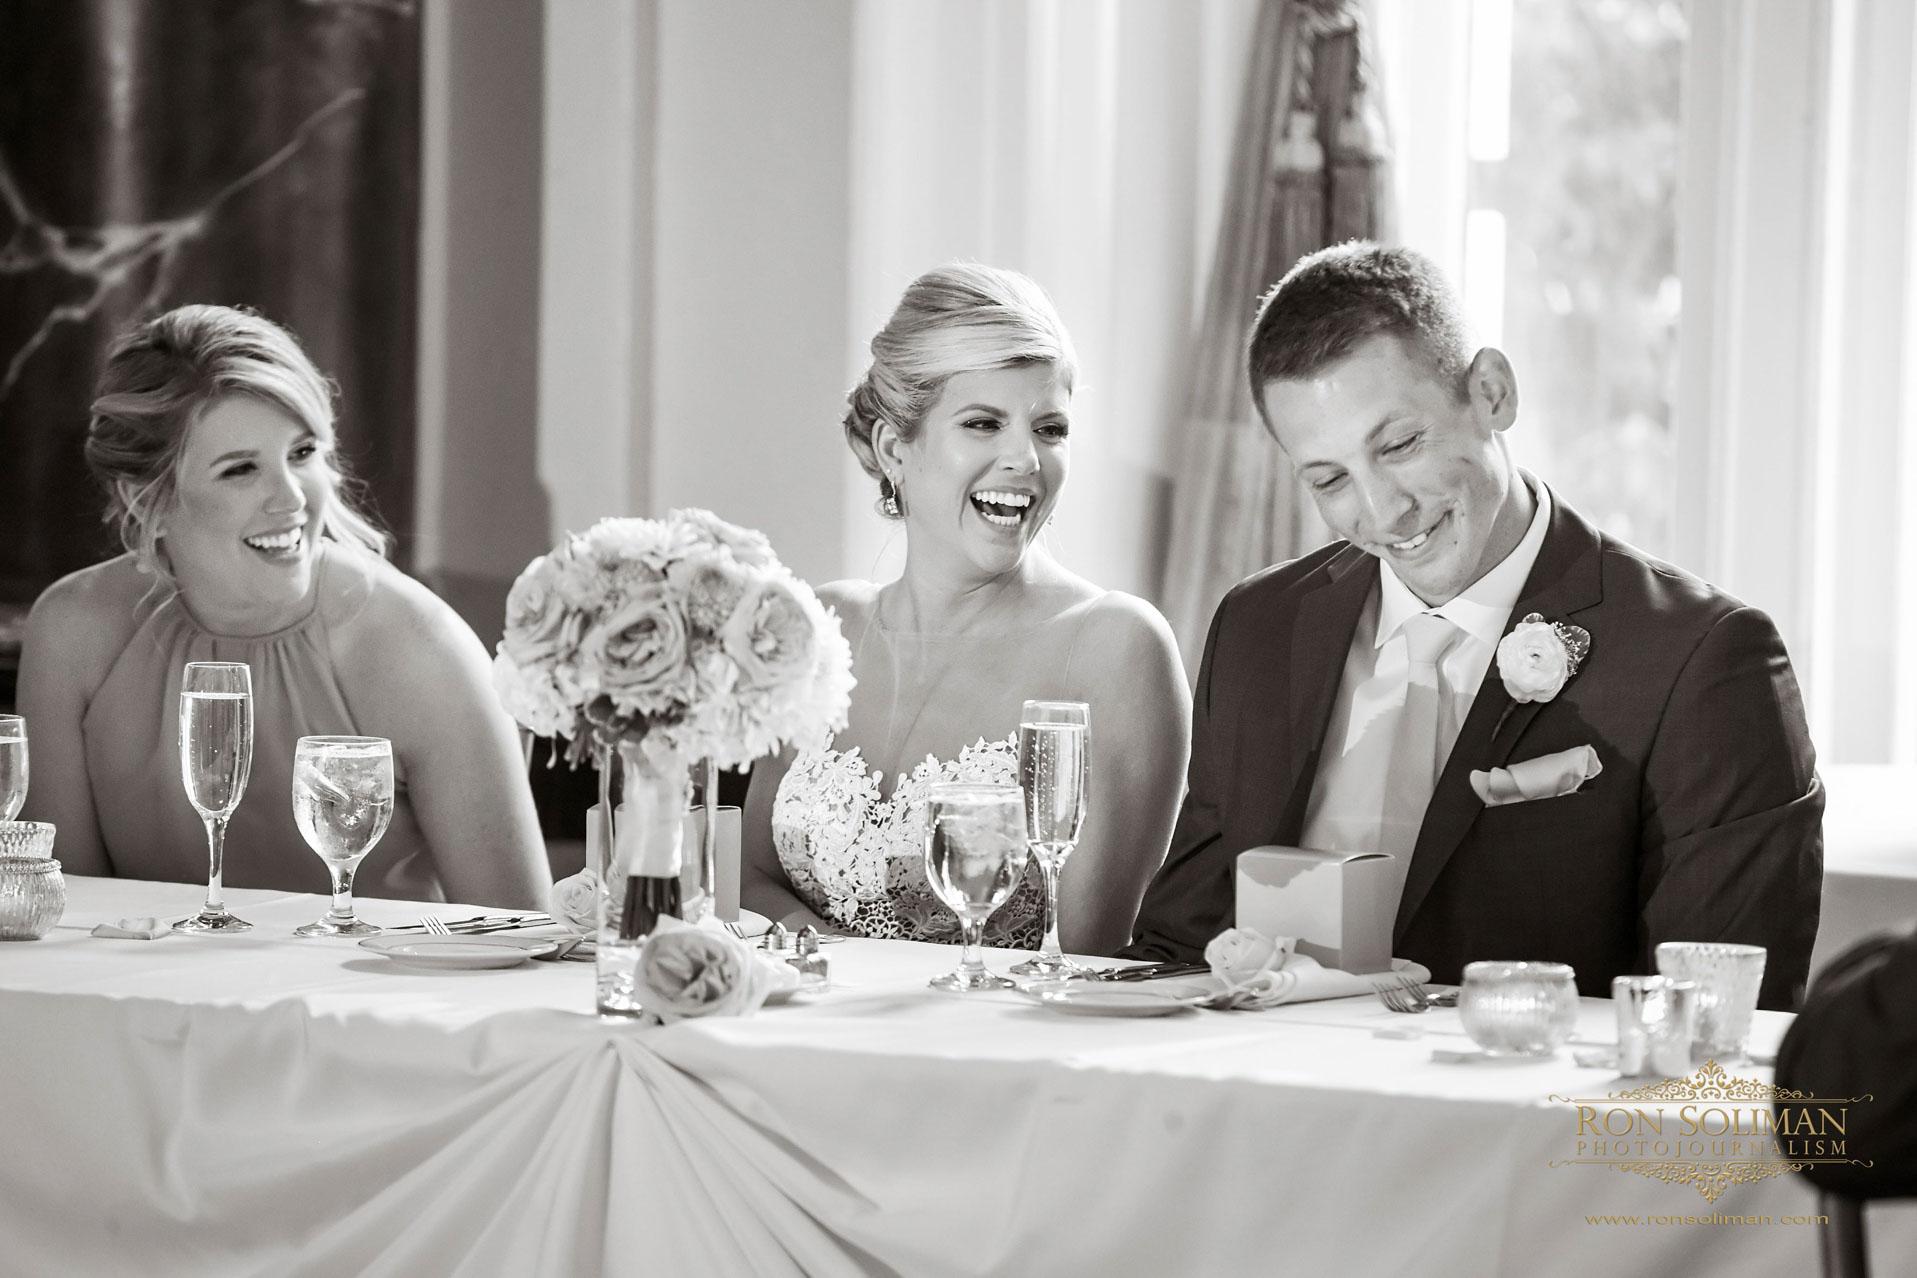 The Belvedere Wedding photos